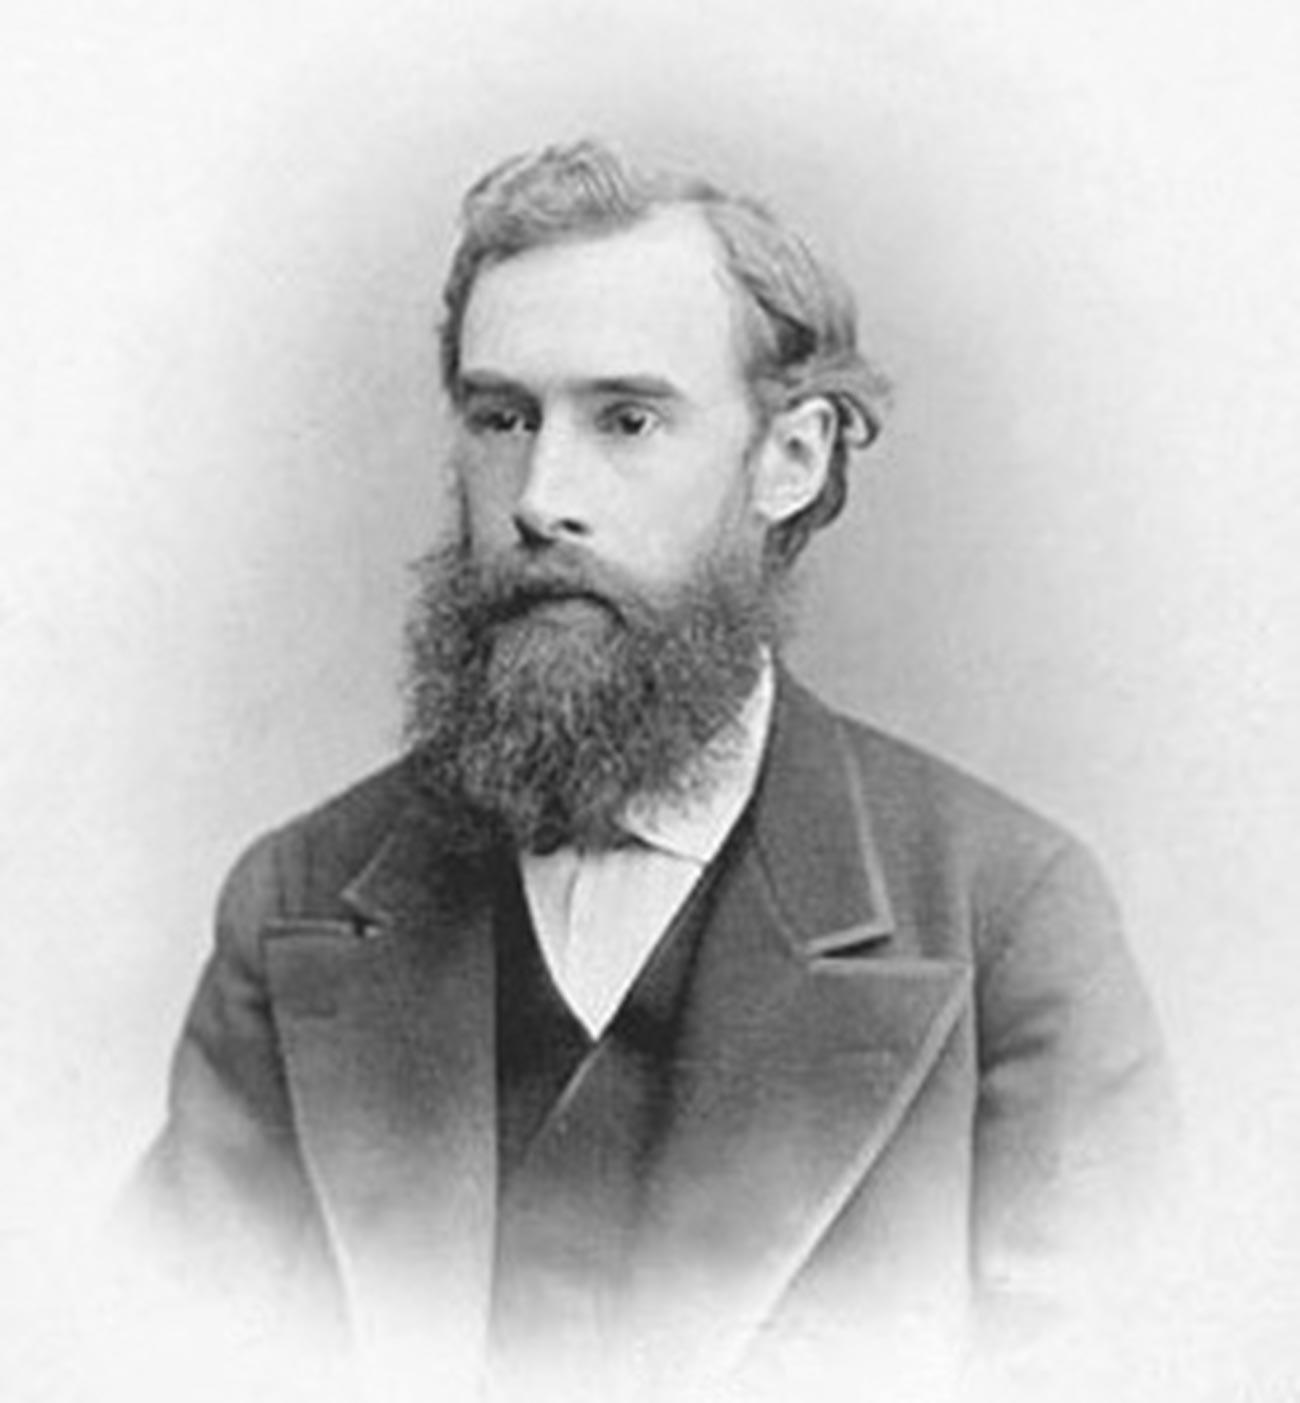 Pavel Tretiakov en 1892